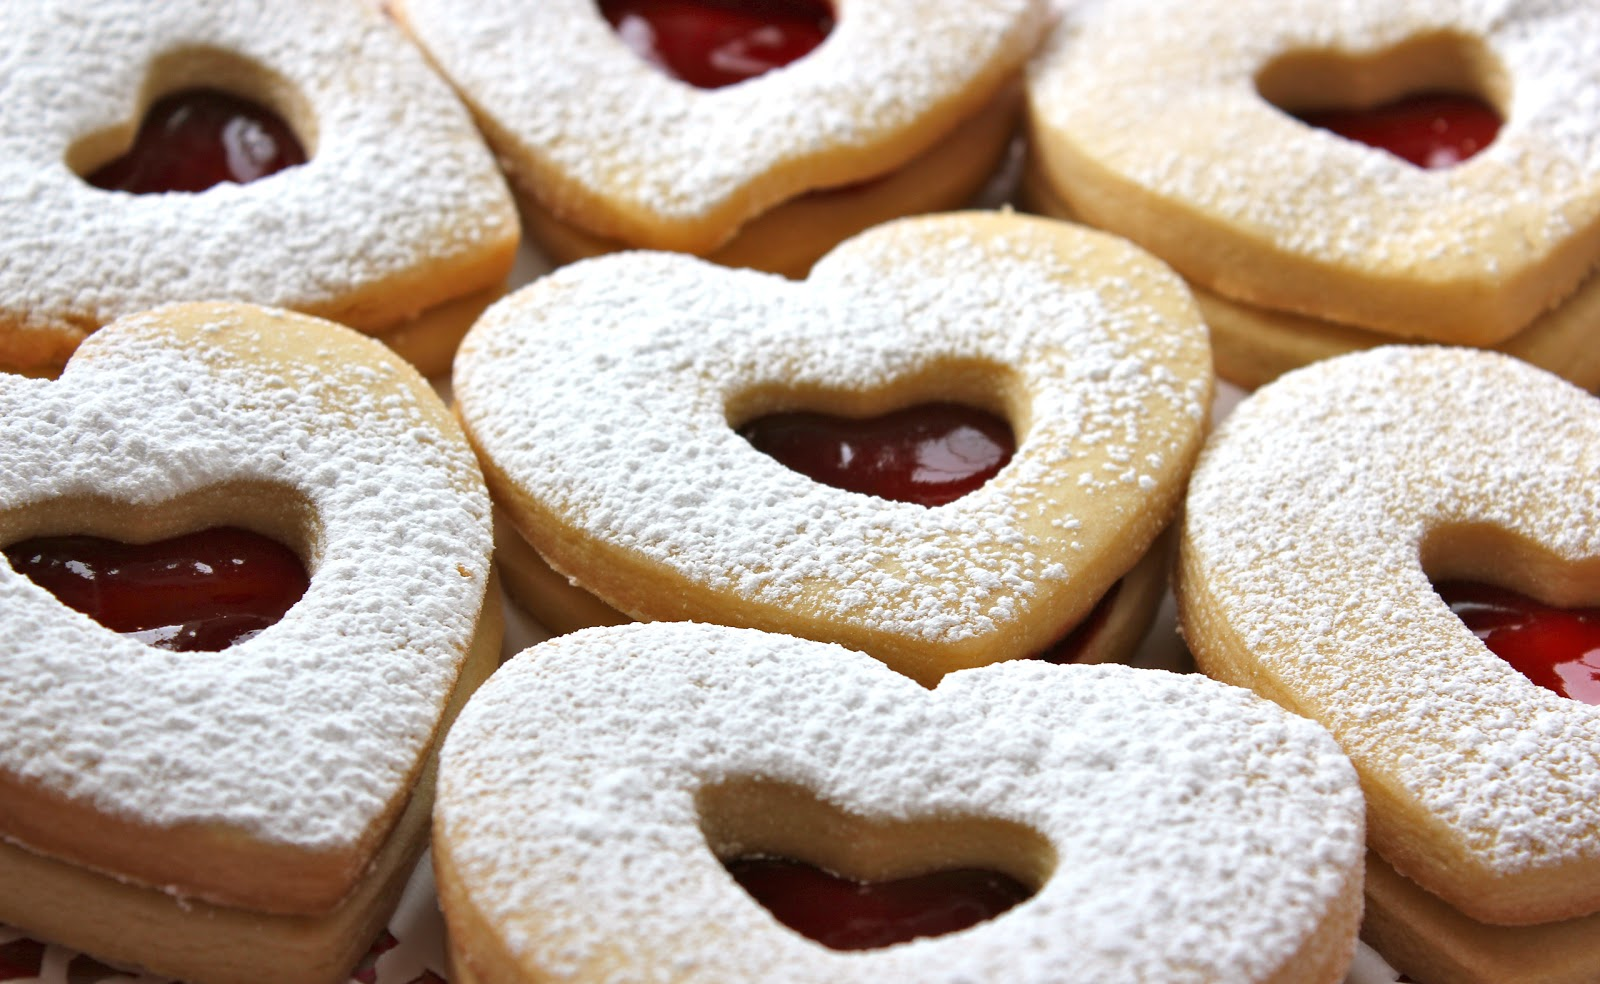 Chelsea's Choice: Raspberry Almond Linzer Cookies